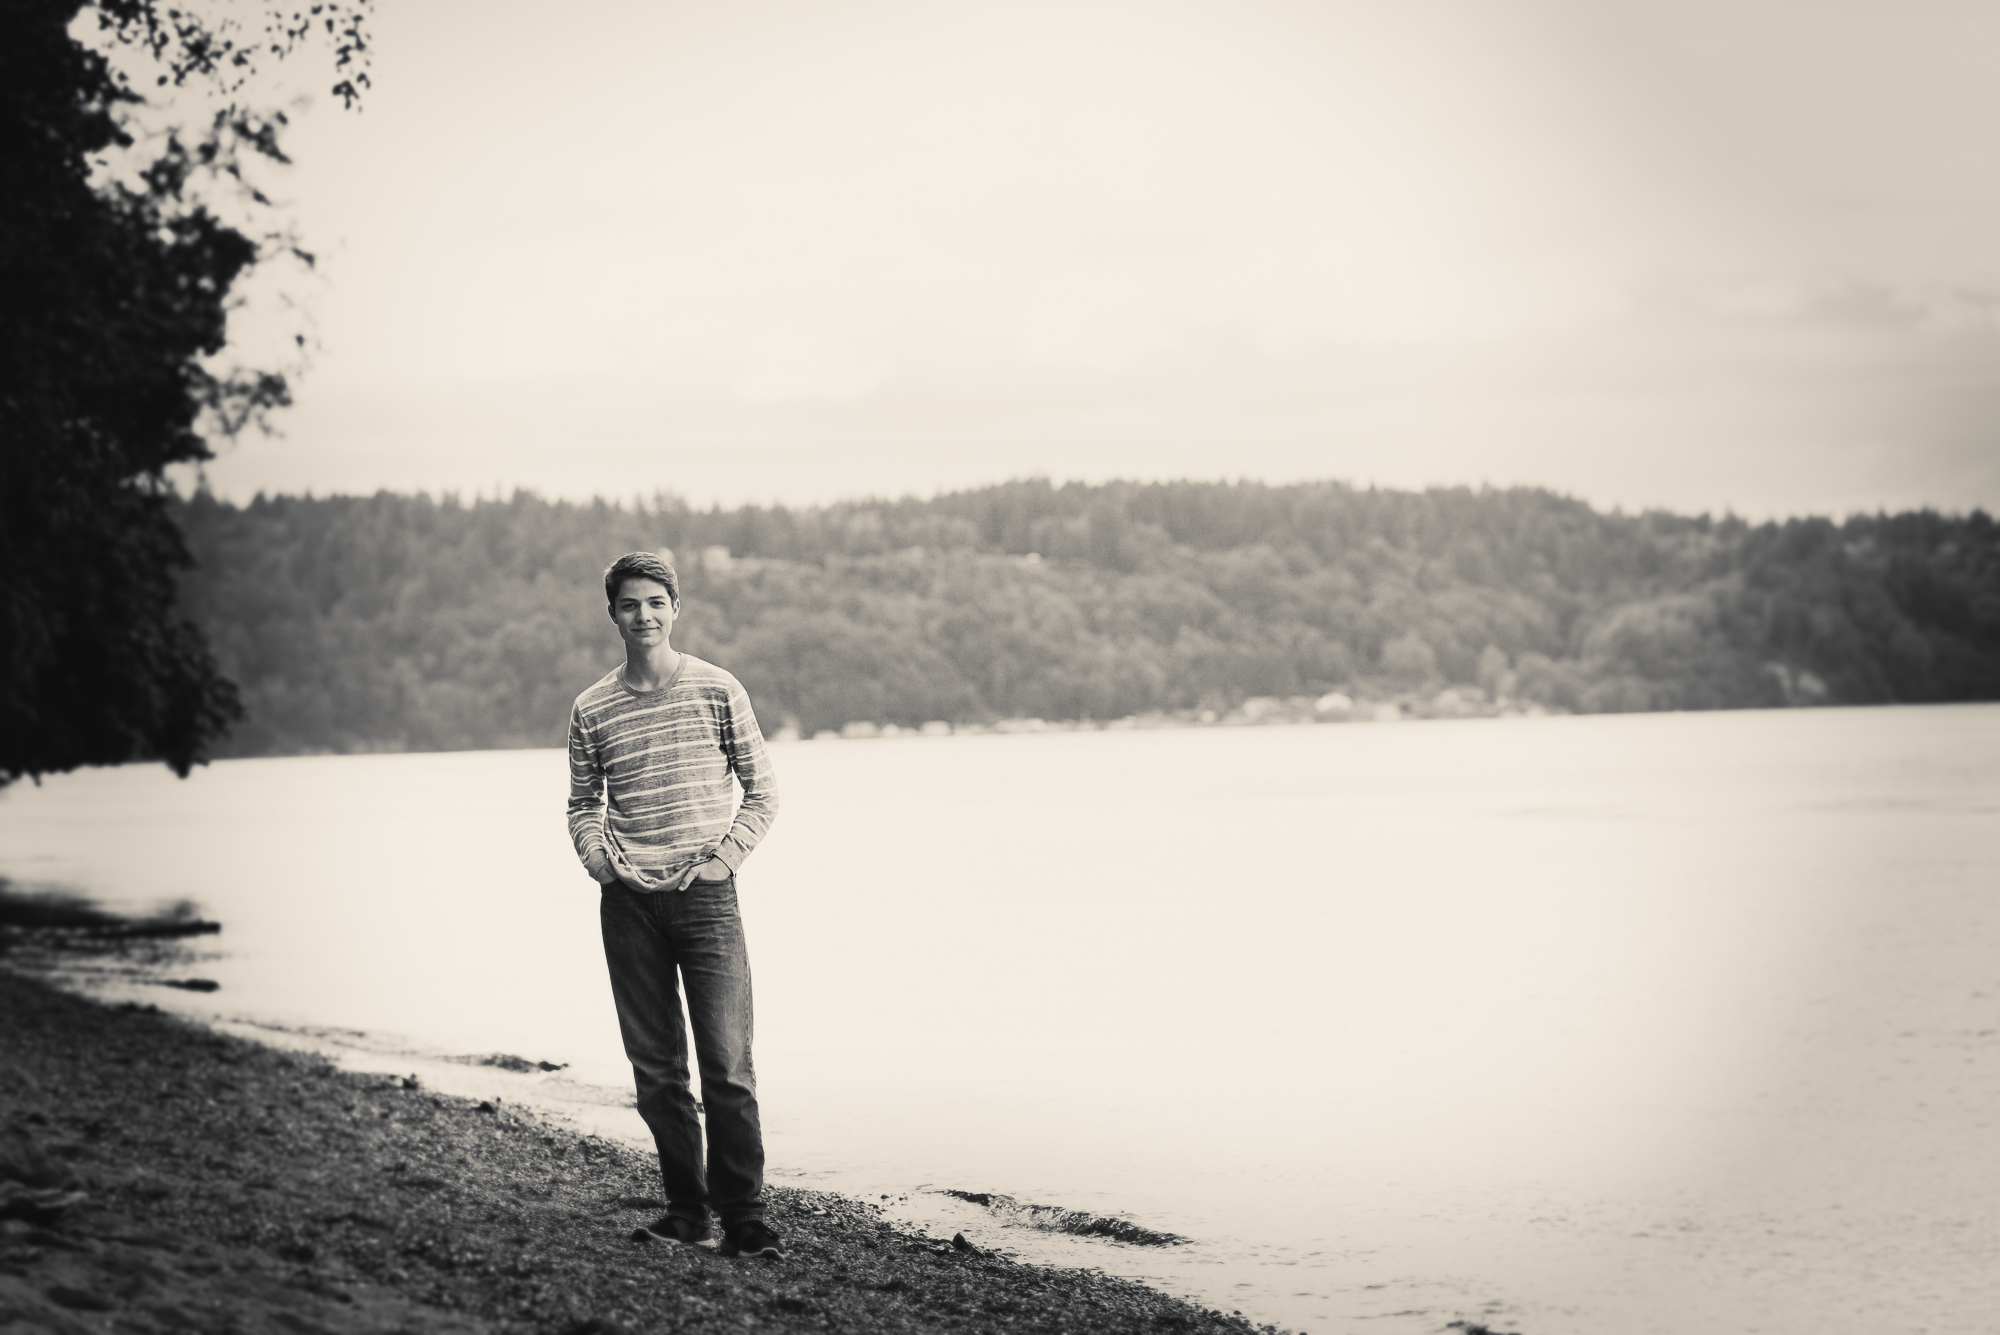 Nate-Senior-Portraits-2cedarsphoto-1.jpg